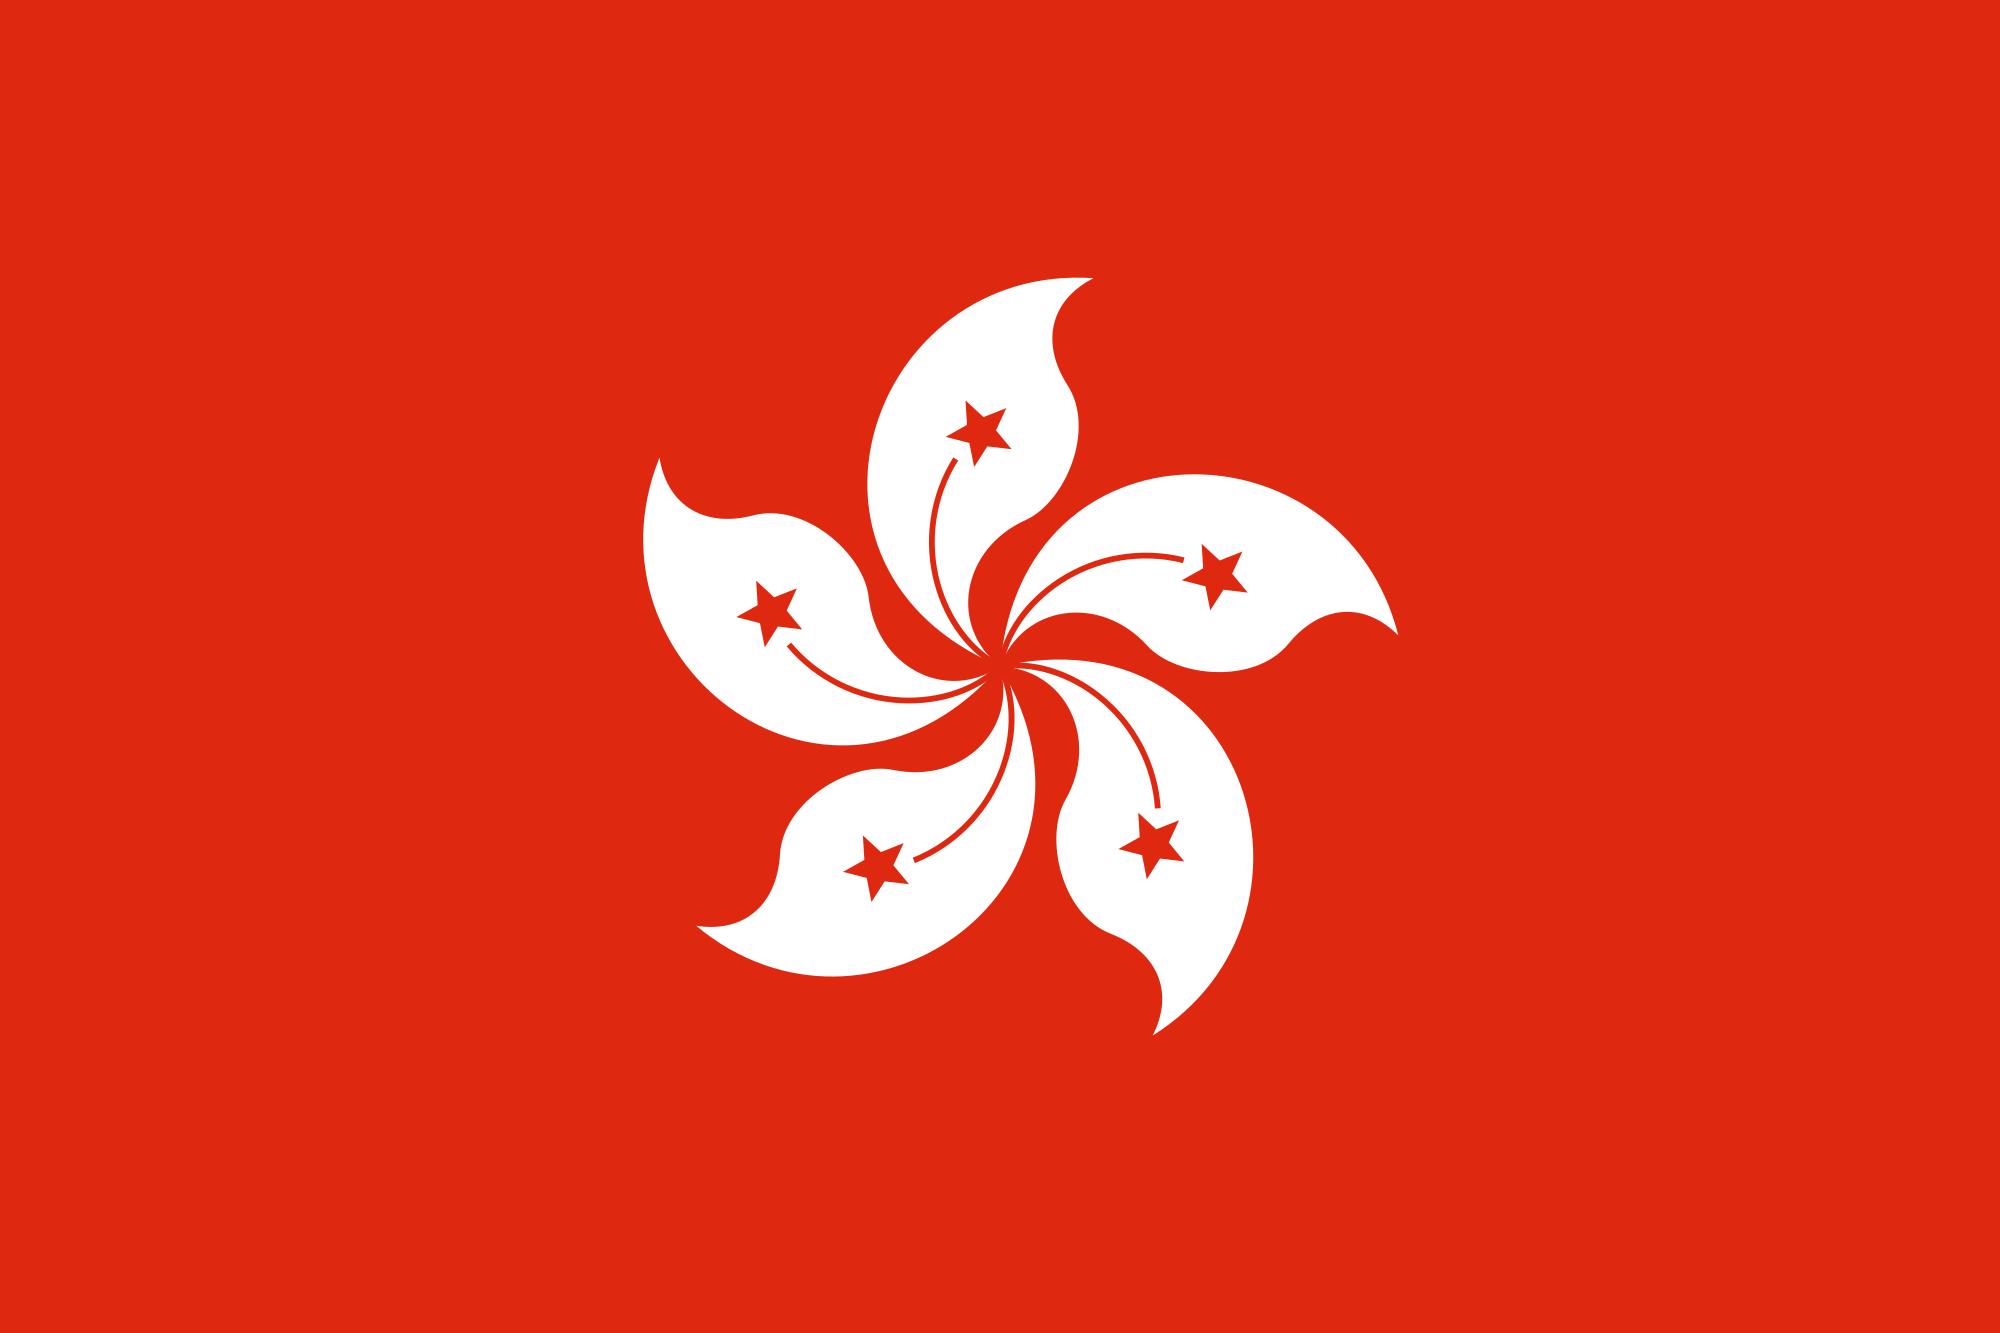 Blink visa Hong Kong Tourist Visa package